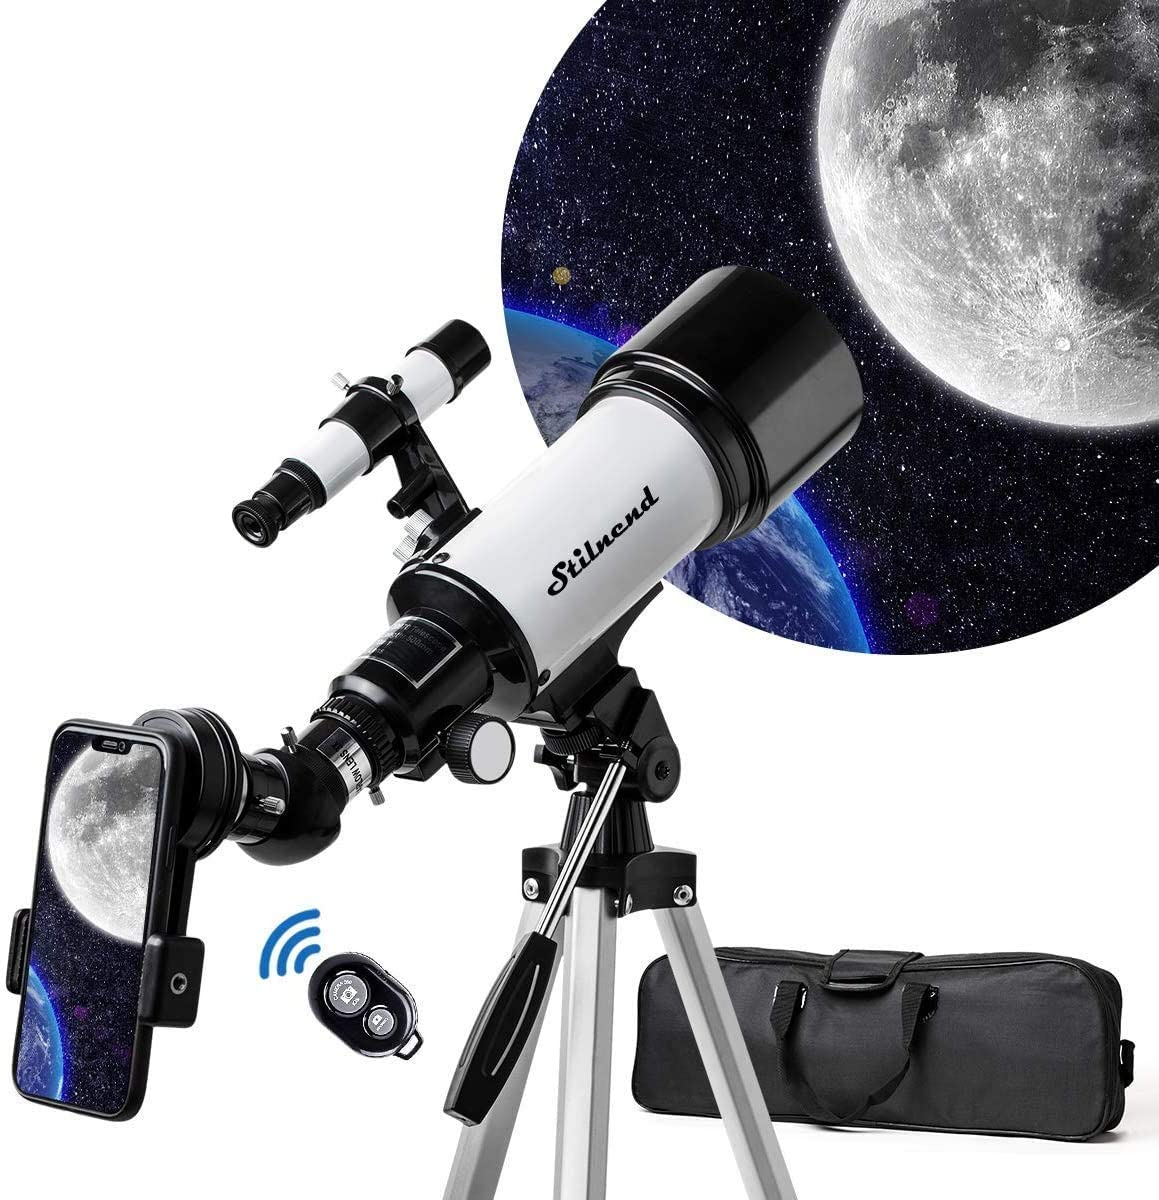 Review of Stilnend Telescope, 70mm Aperture, 500mm AZ Mount Astronomical, Refractor Telescope